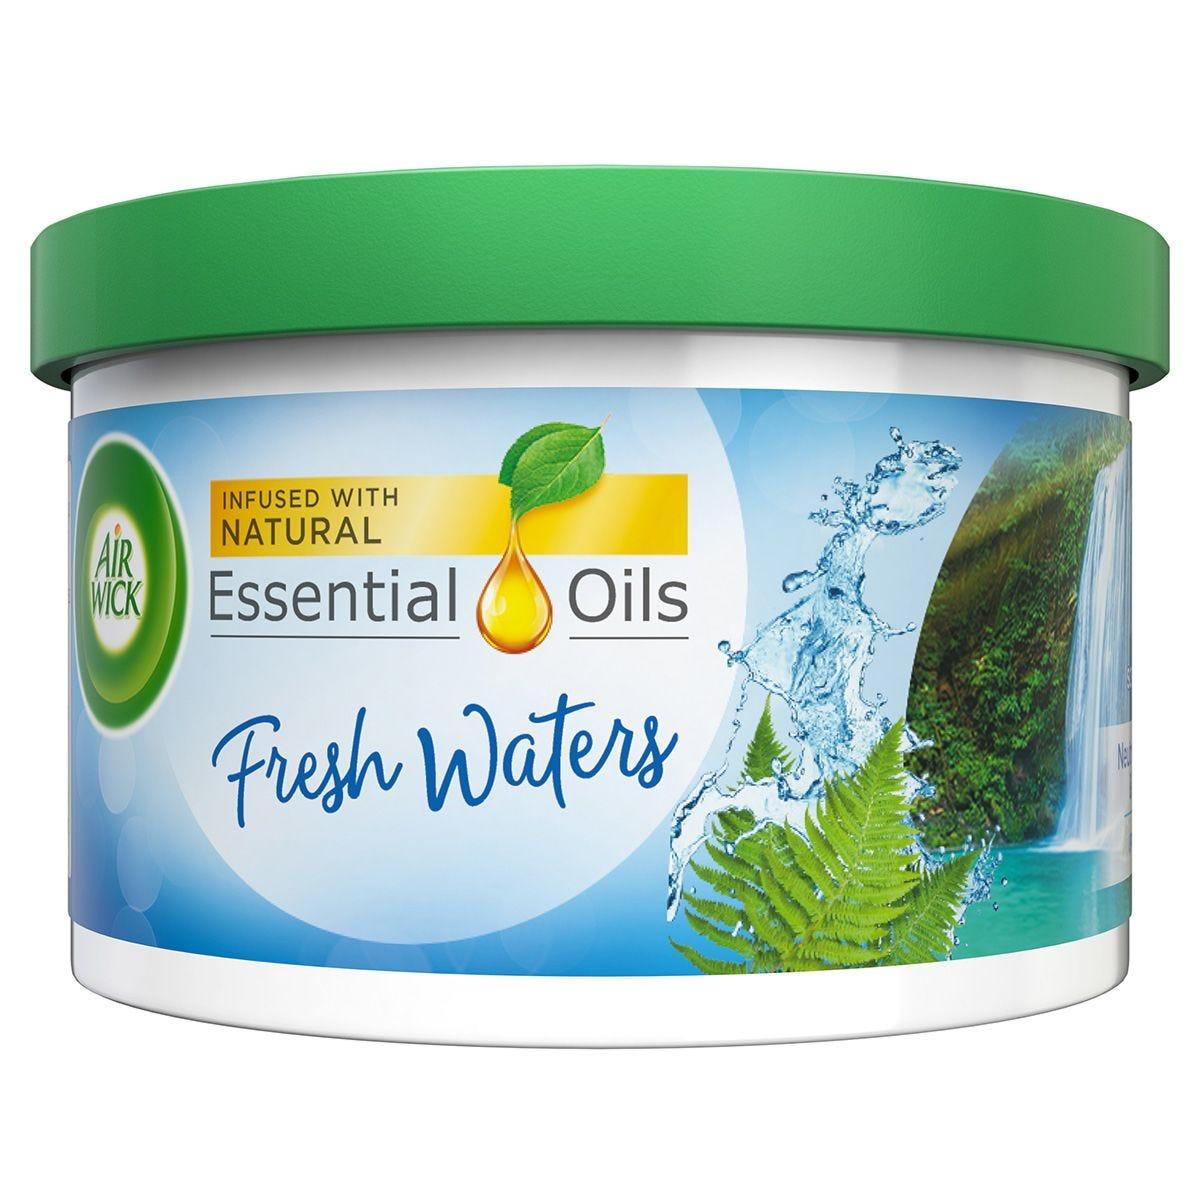 Airwick Gel Tin - Fresh Waters 70g